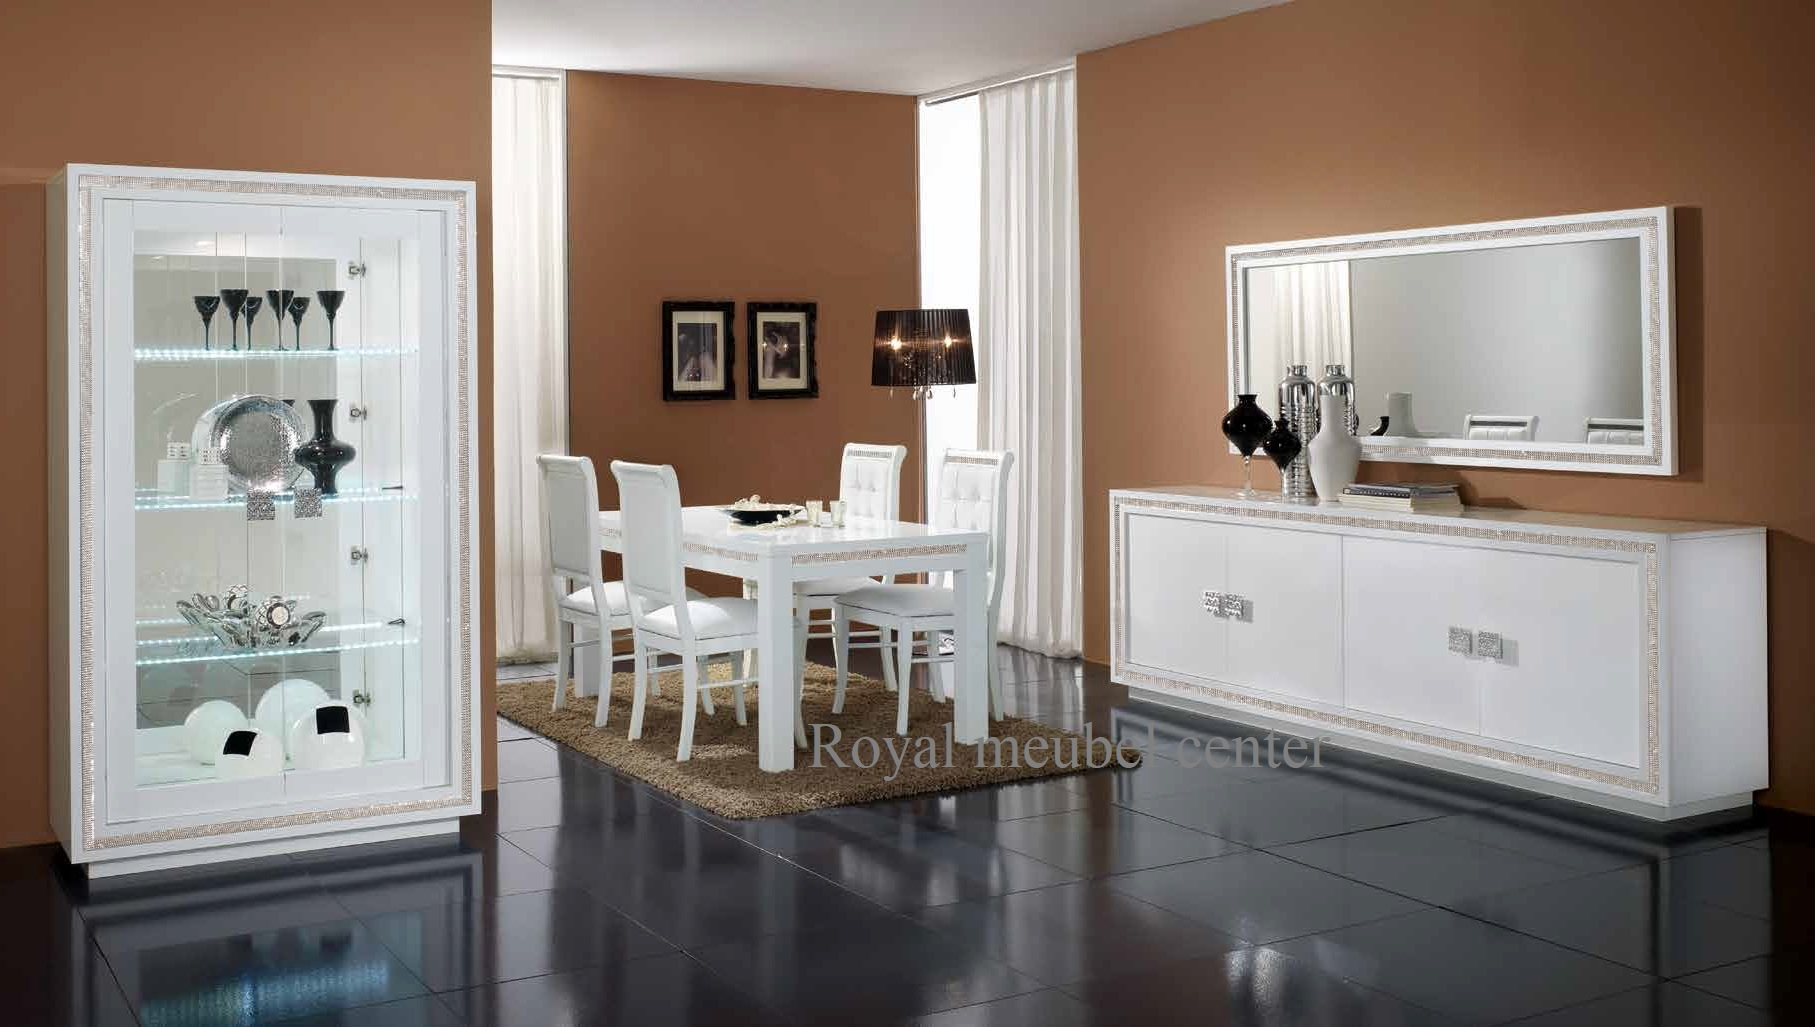 https://www.royalmeubelcenter.nl/data/upload/Shop/images/perla-woonkamer-meubel-sethoogglans-witwwwroyalmeubelcenternl-1.jpg